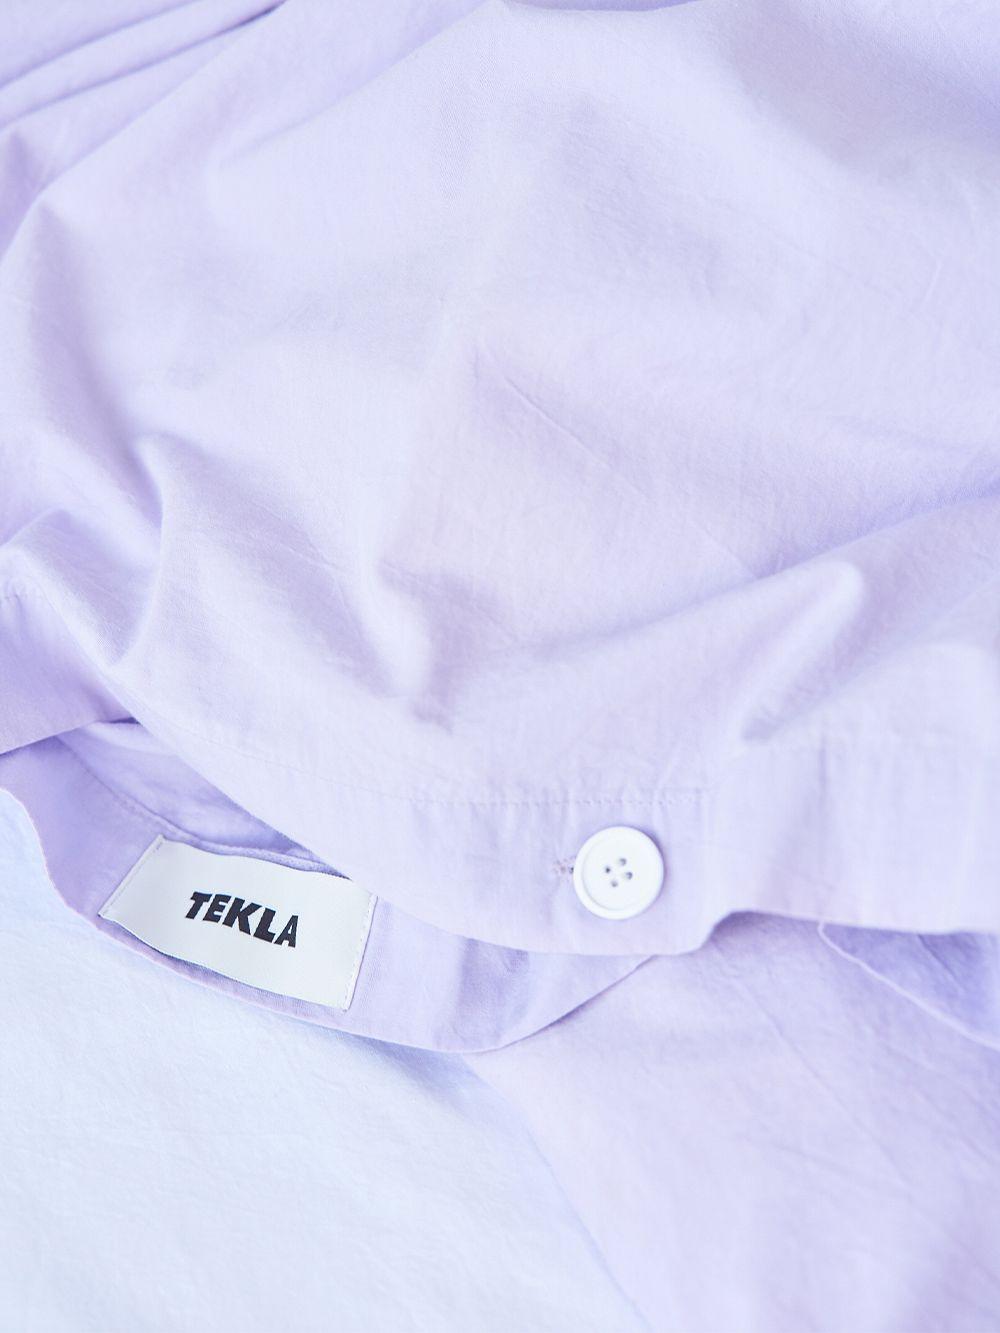 Tekla Single duvet cover, 150 x 210 cm, lavender